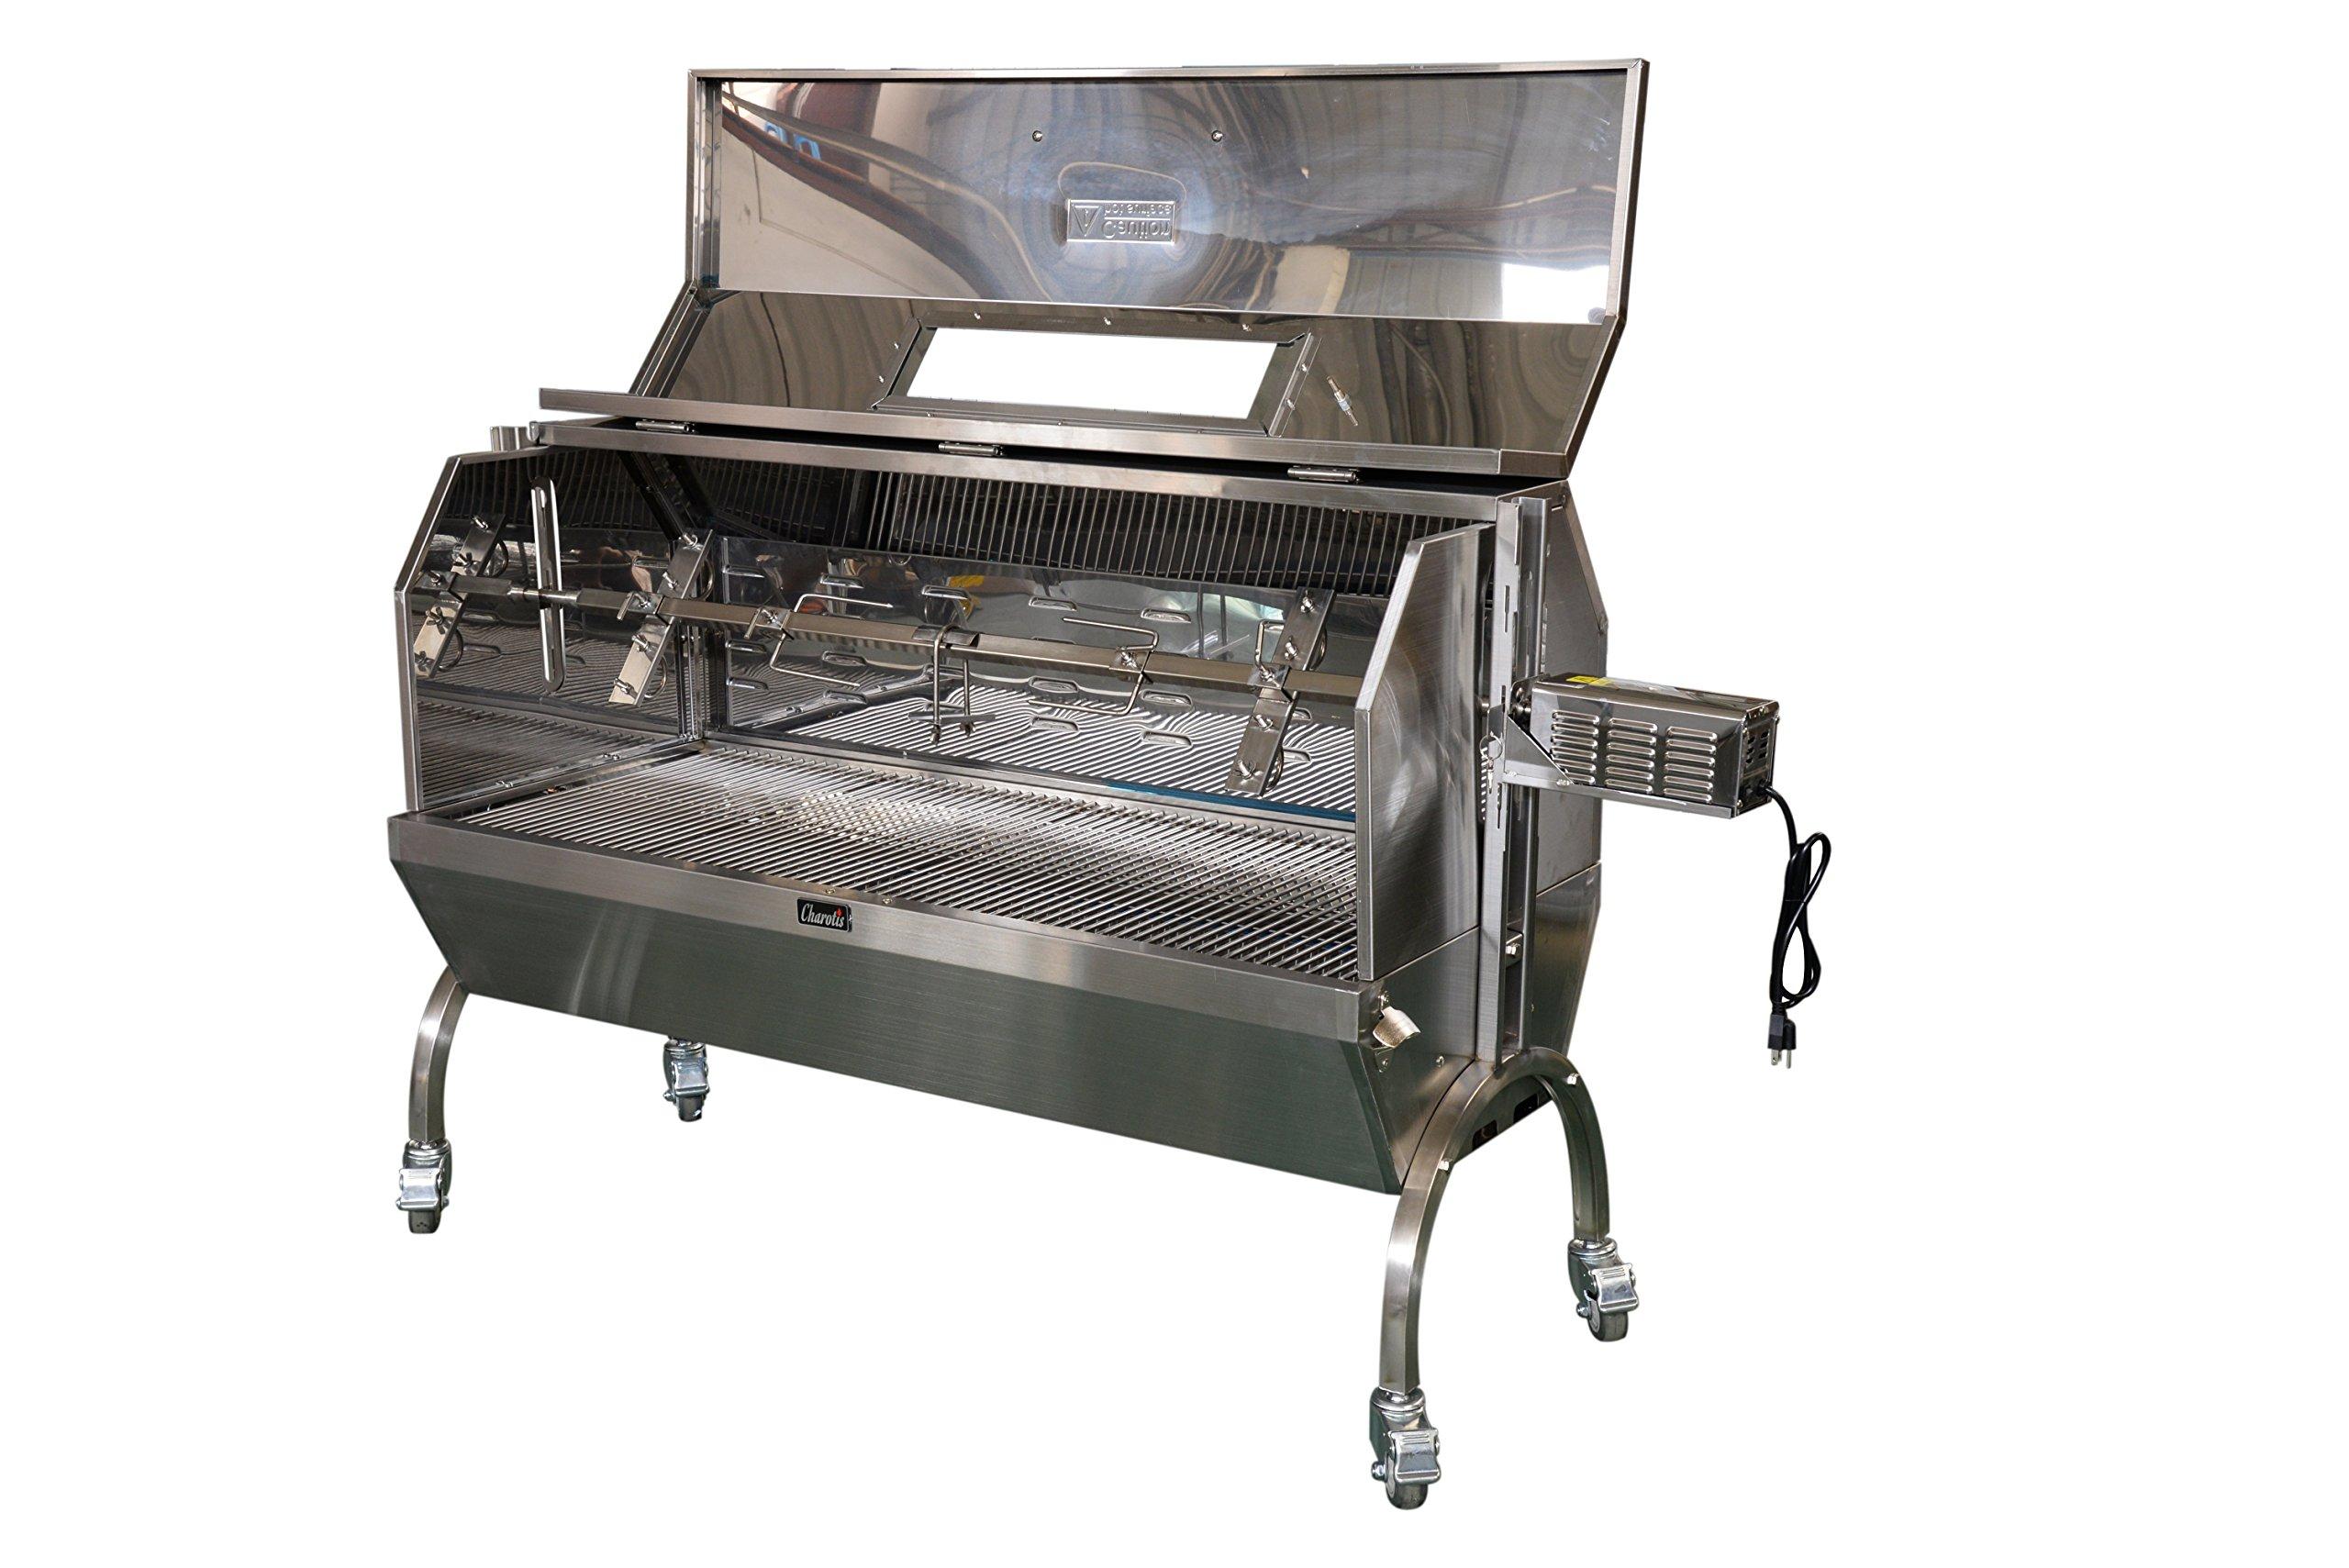 Charotis Charcoal Spit Roaster, 60W Motor, 100% Stainless Steel BBQ rotisserie for Whole Pig, Lamb, Goat - Model SSH1-DX